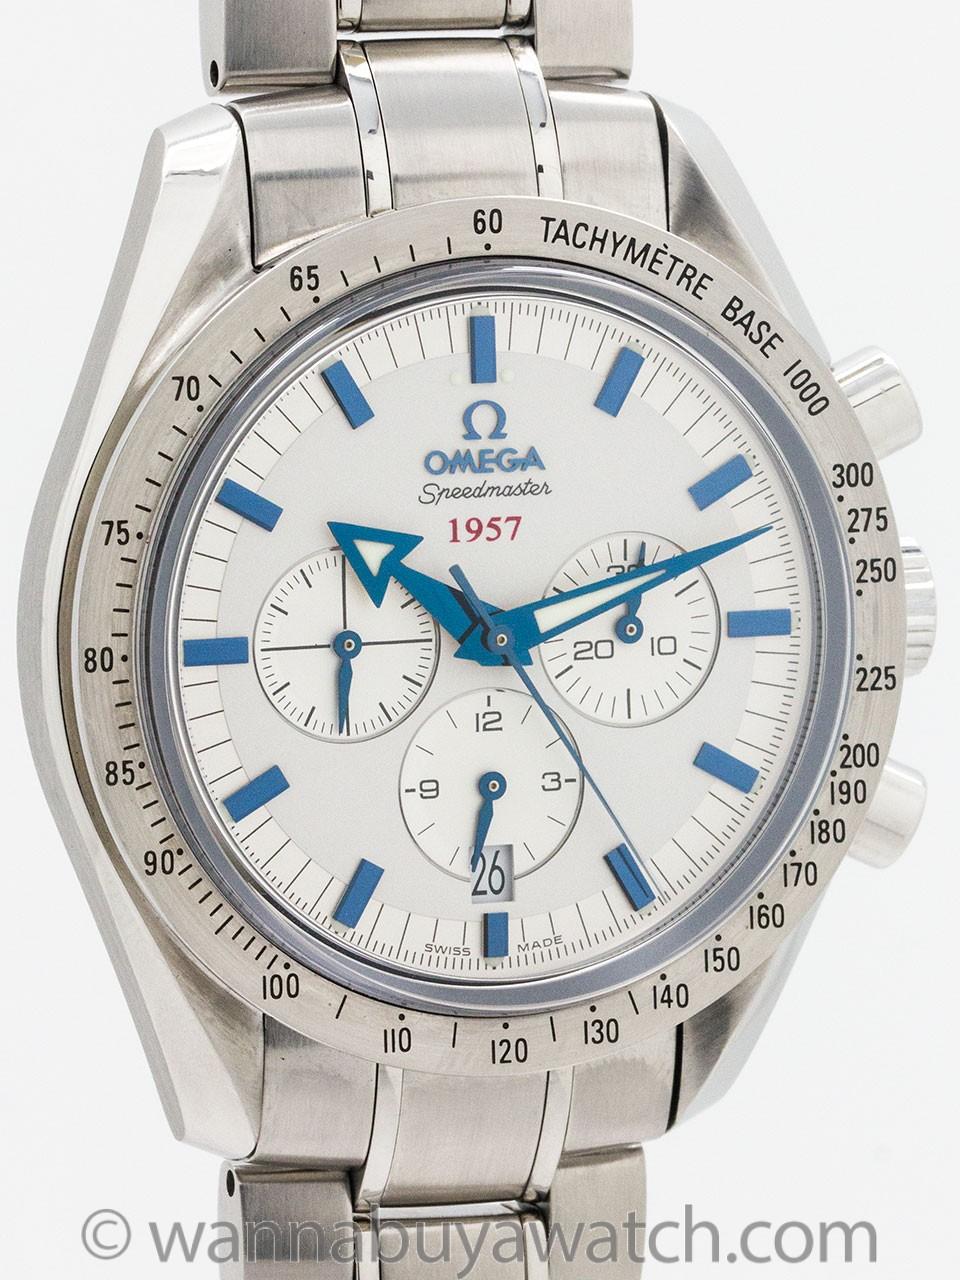 Omega Speedmaster ref 3211.04.25 Broad Arrow 1957 50th Anniversary